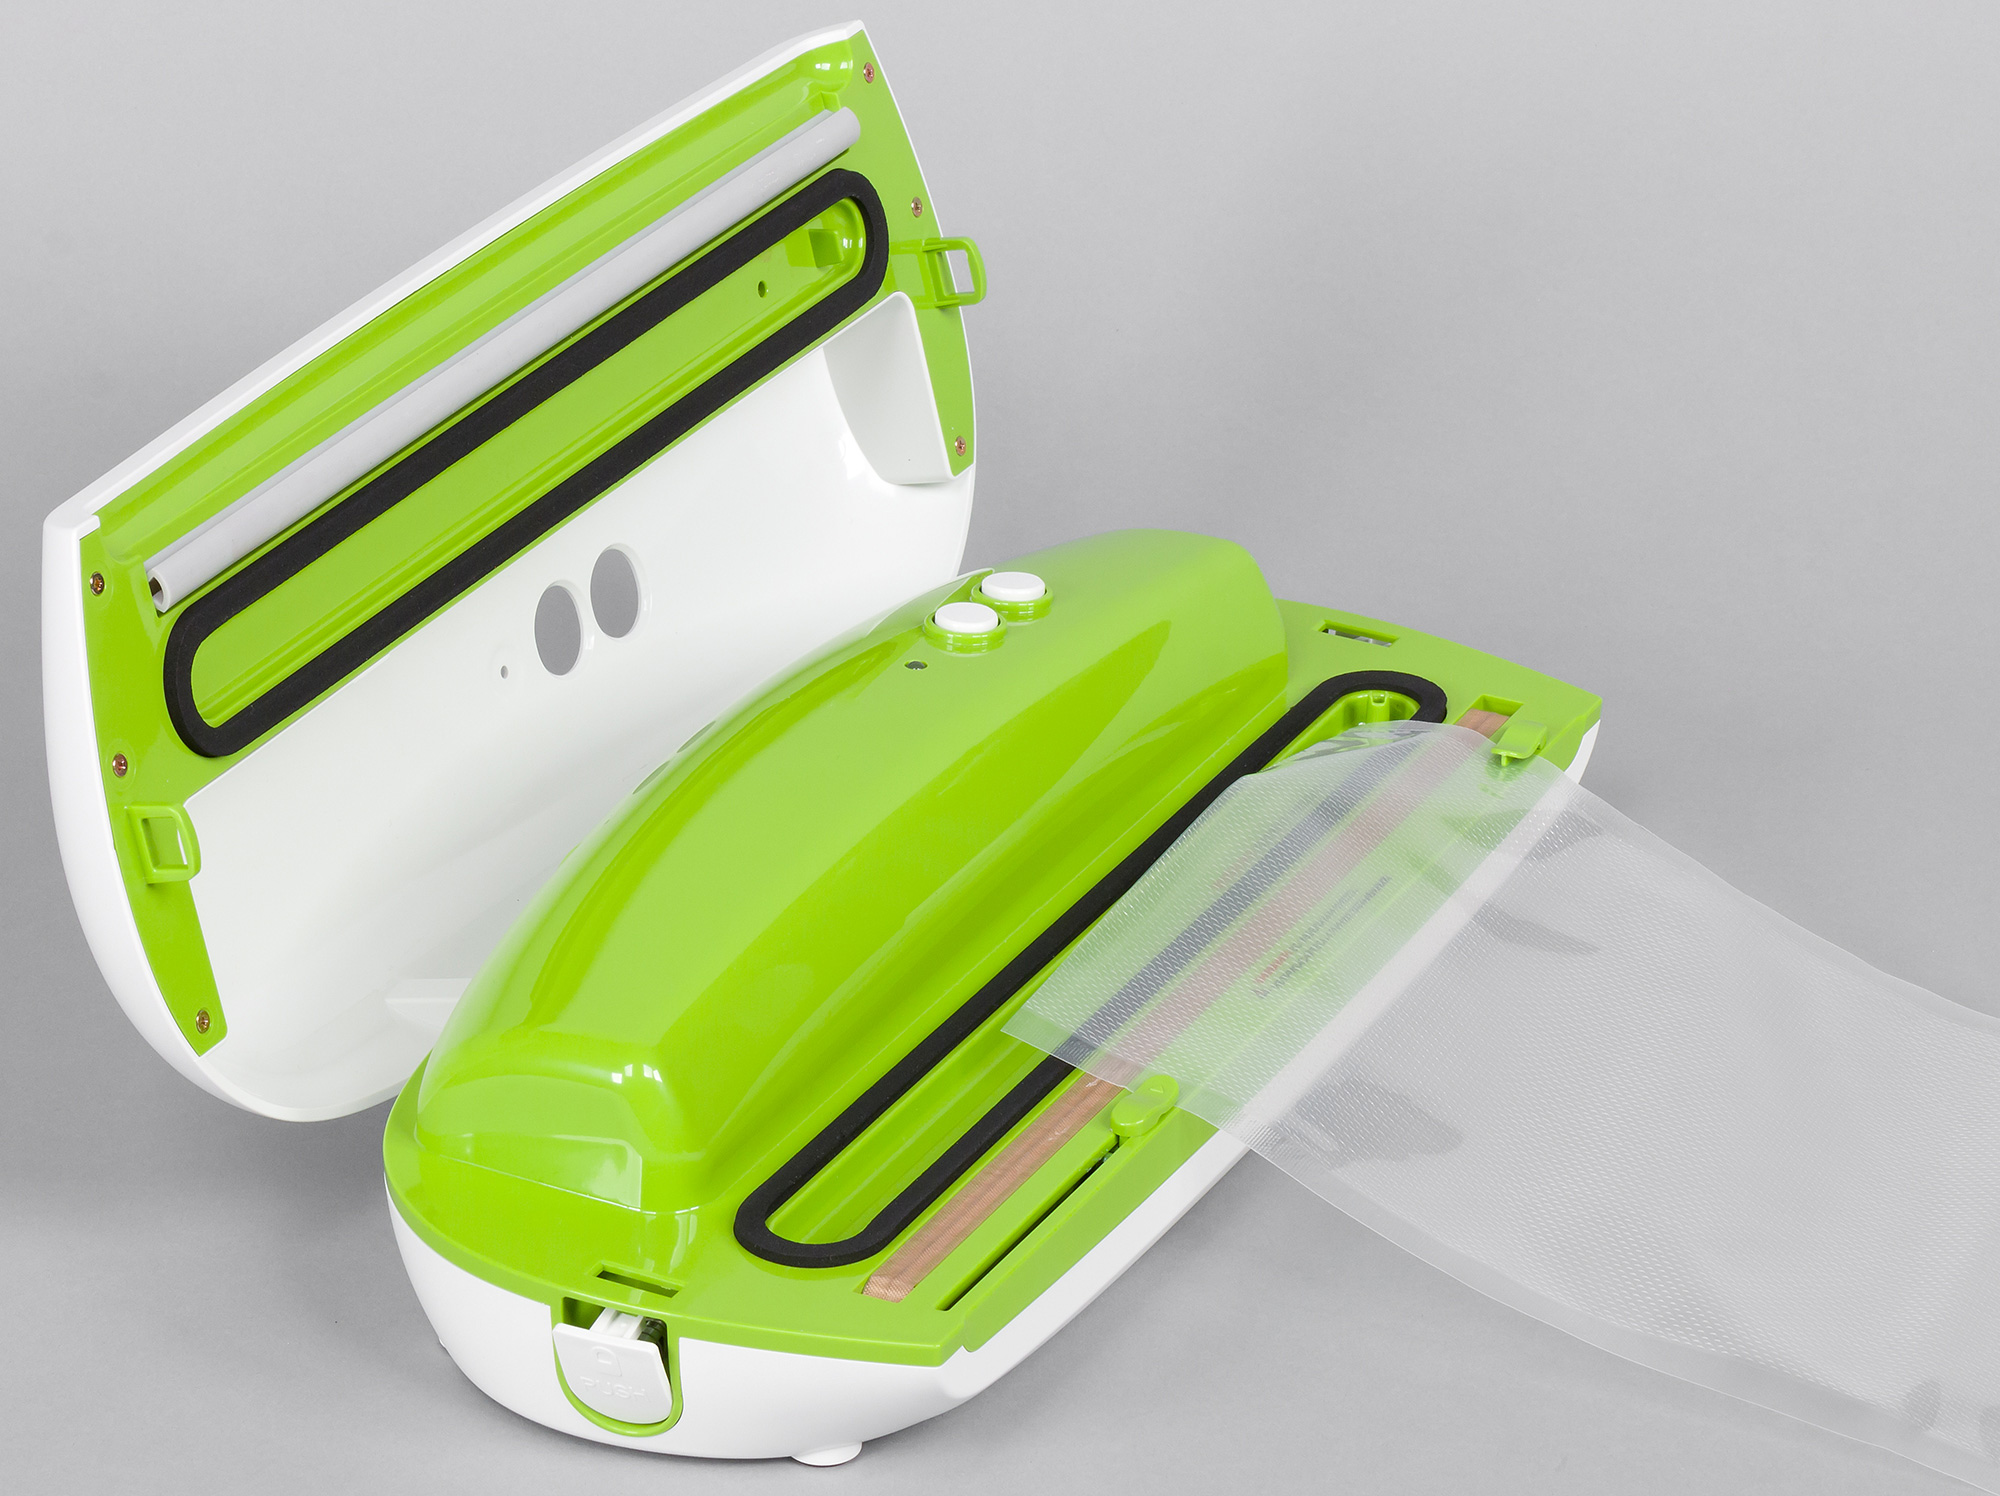 Популярный вакуумный упаковщик пул аут вакуумный аппарат